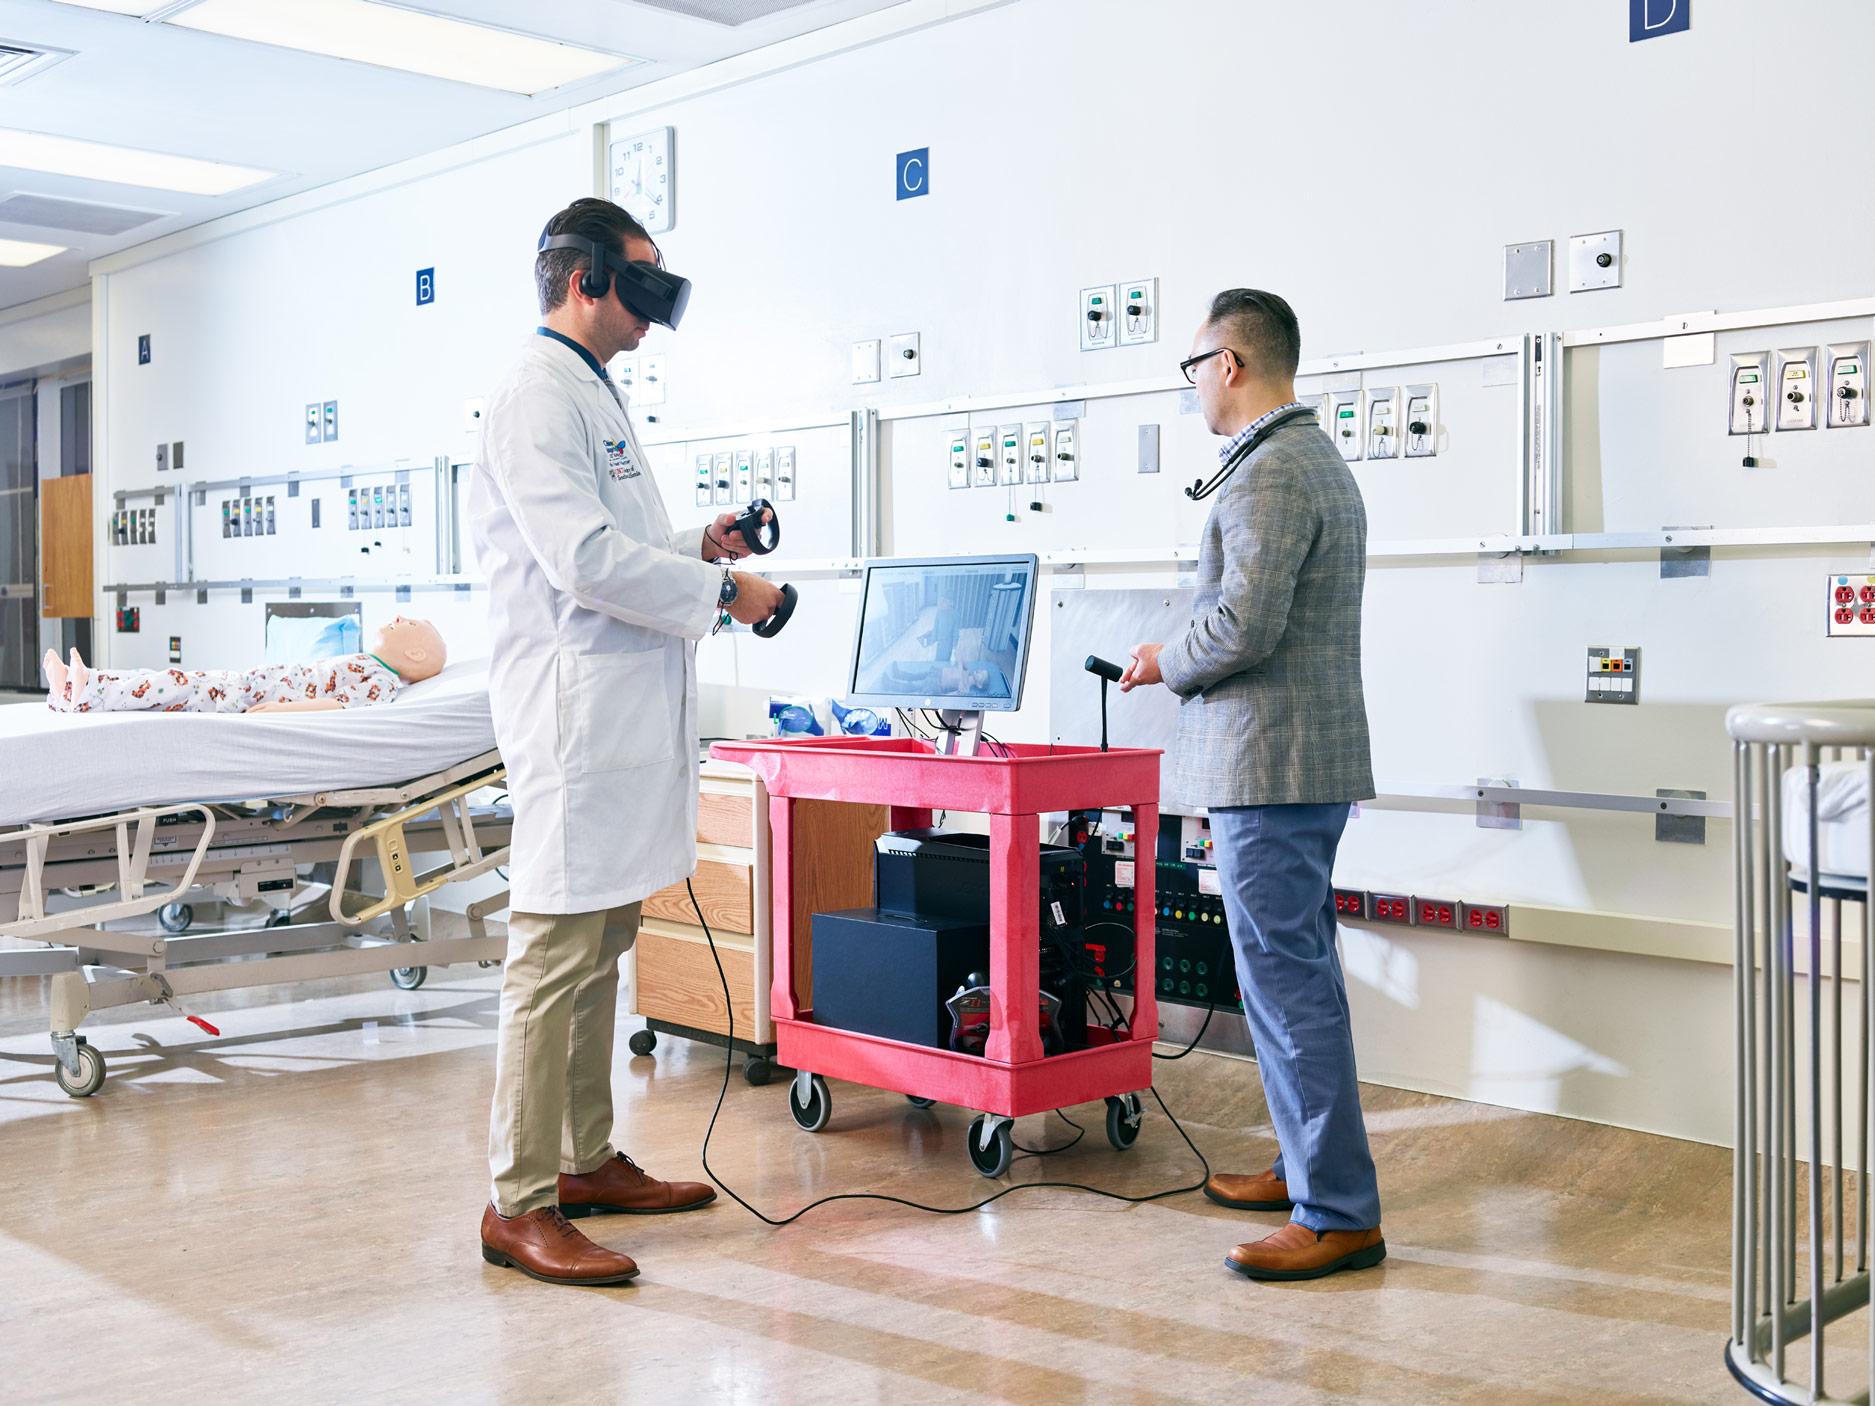 VR Simulation Training, Children's Hospital, Los Angeles, California, 2018